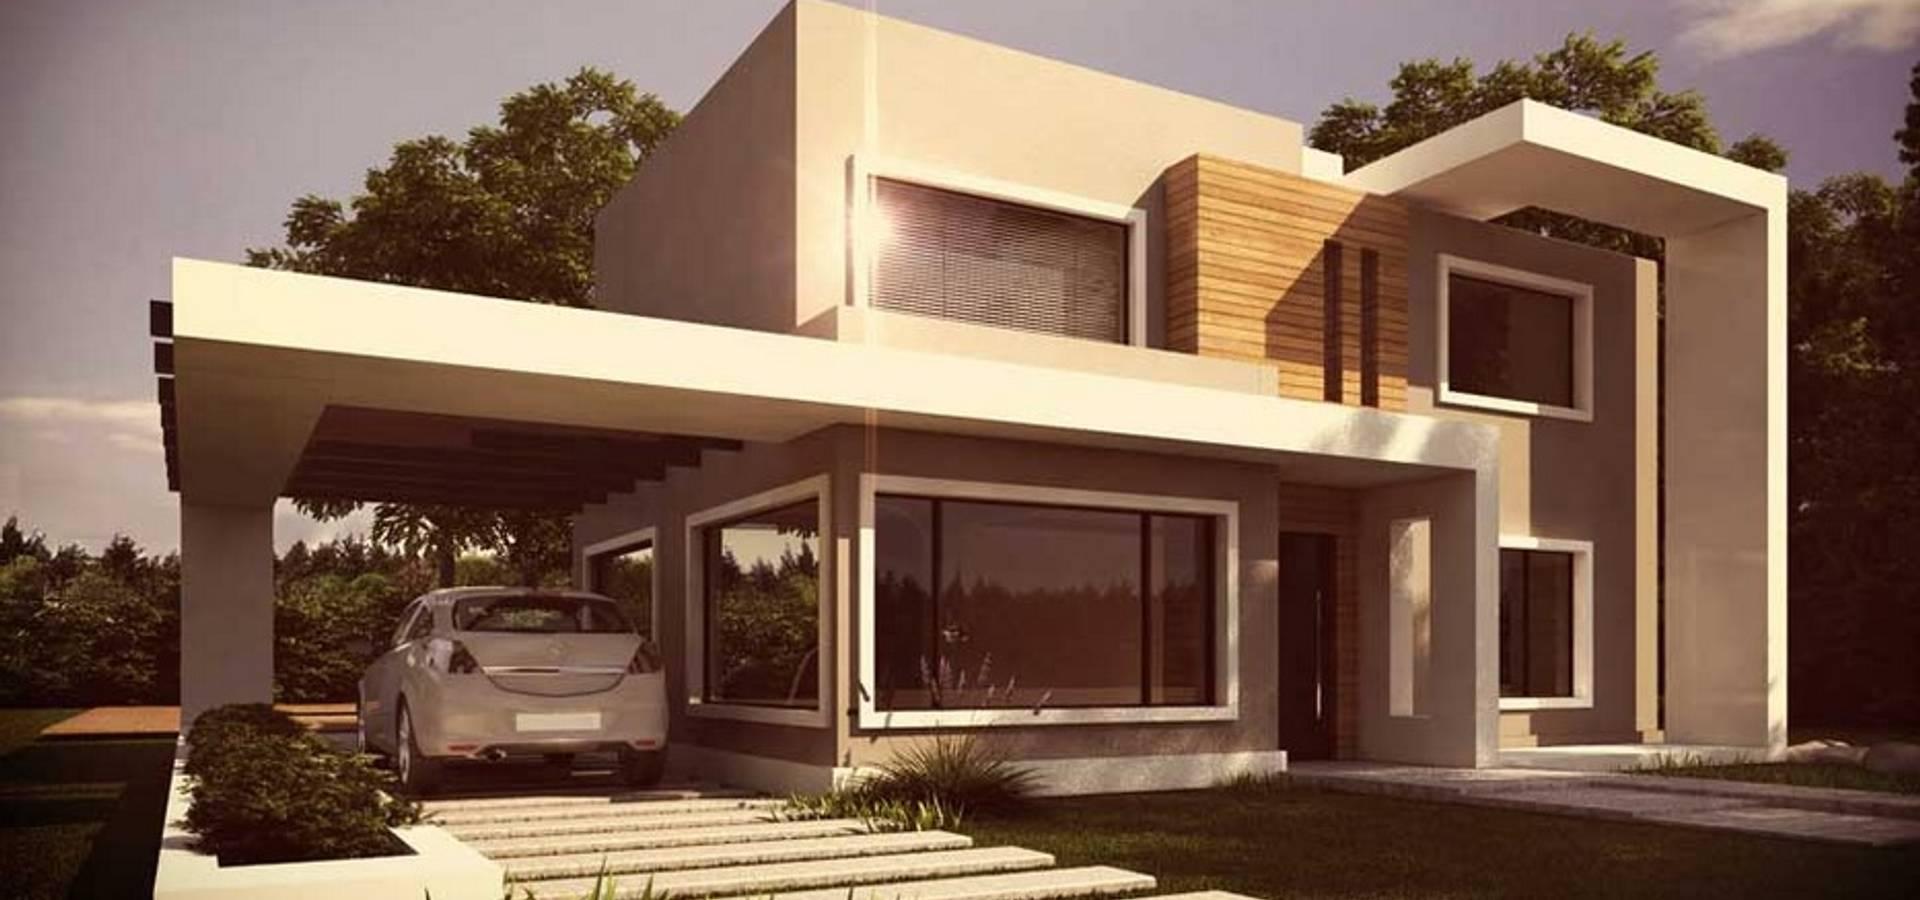 arquitectura siglo XXI